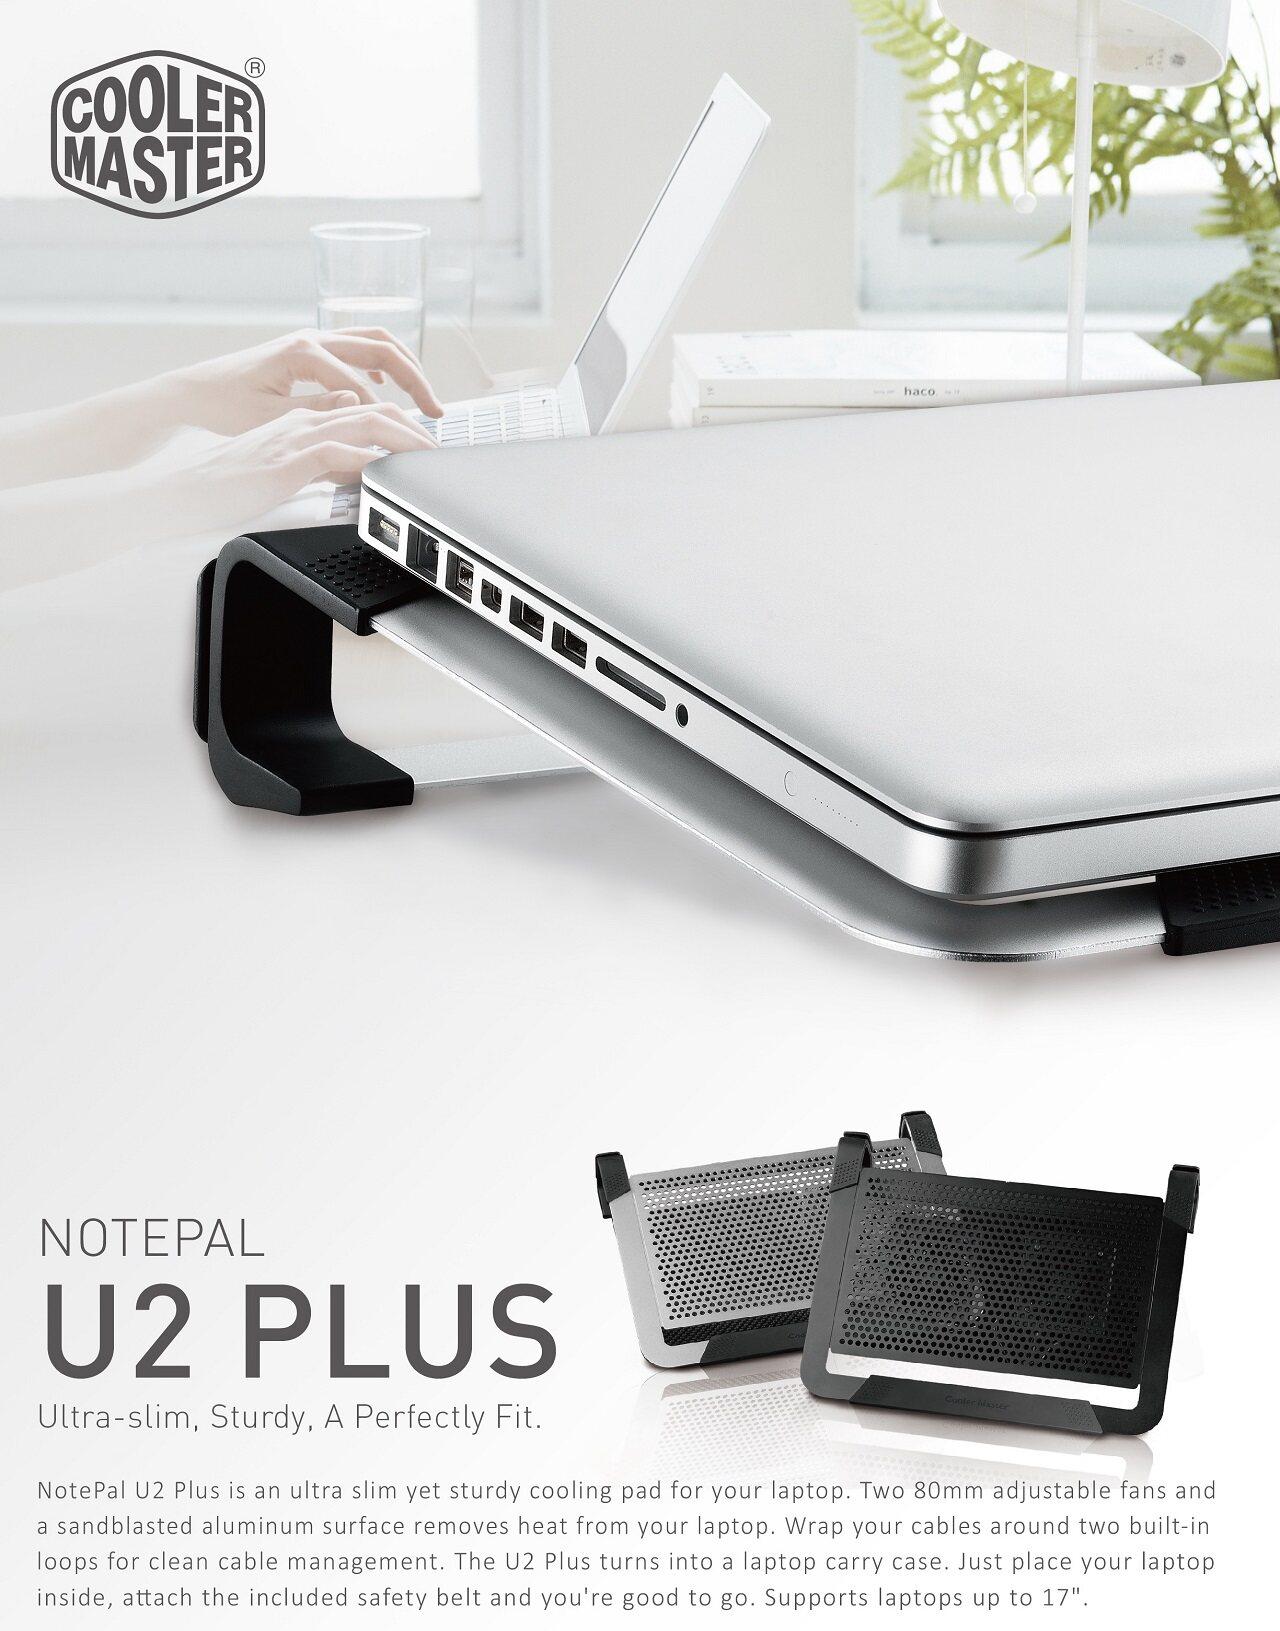 fb5fa180e4 Specifications of Cooler Master Notepal U2 Plus Aluminum Slim Professional  Notebook Cooler (Black)